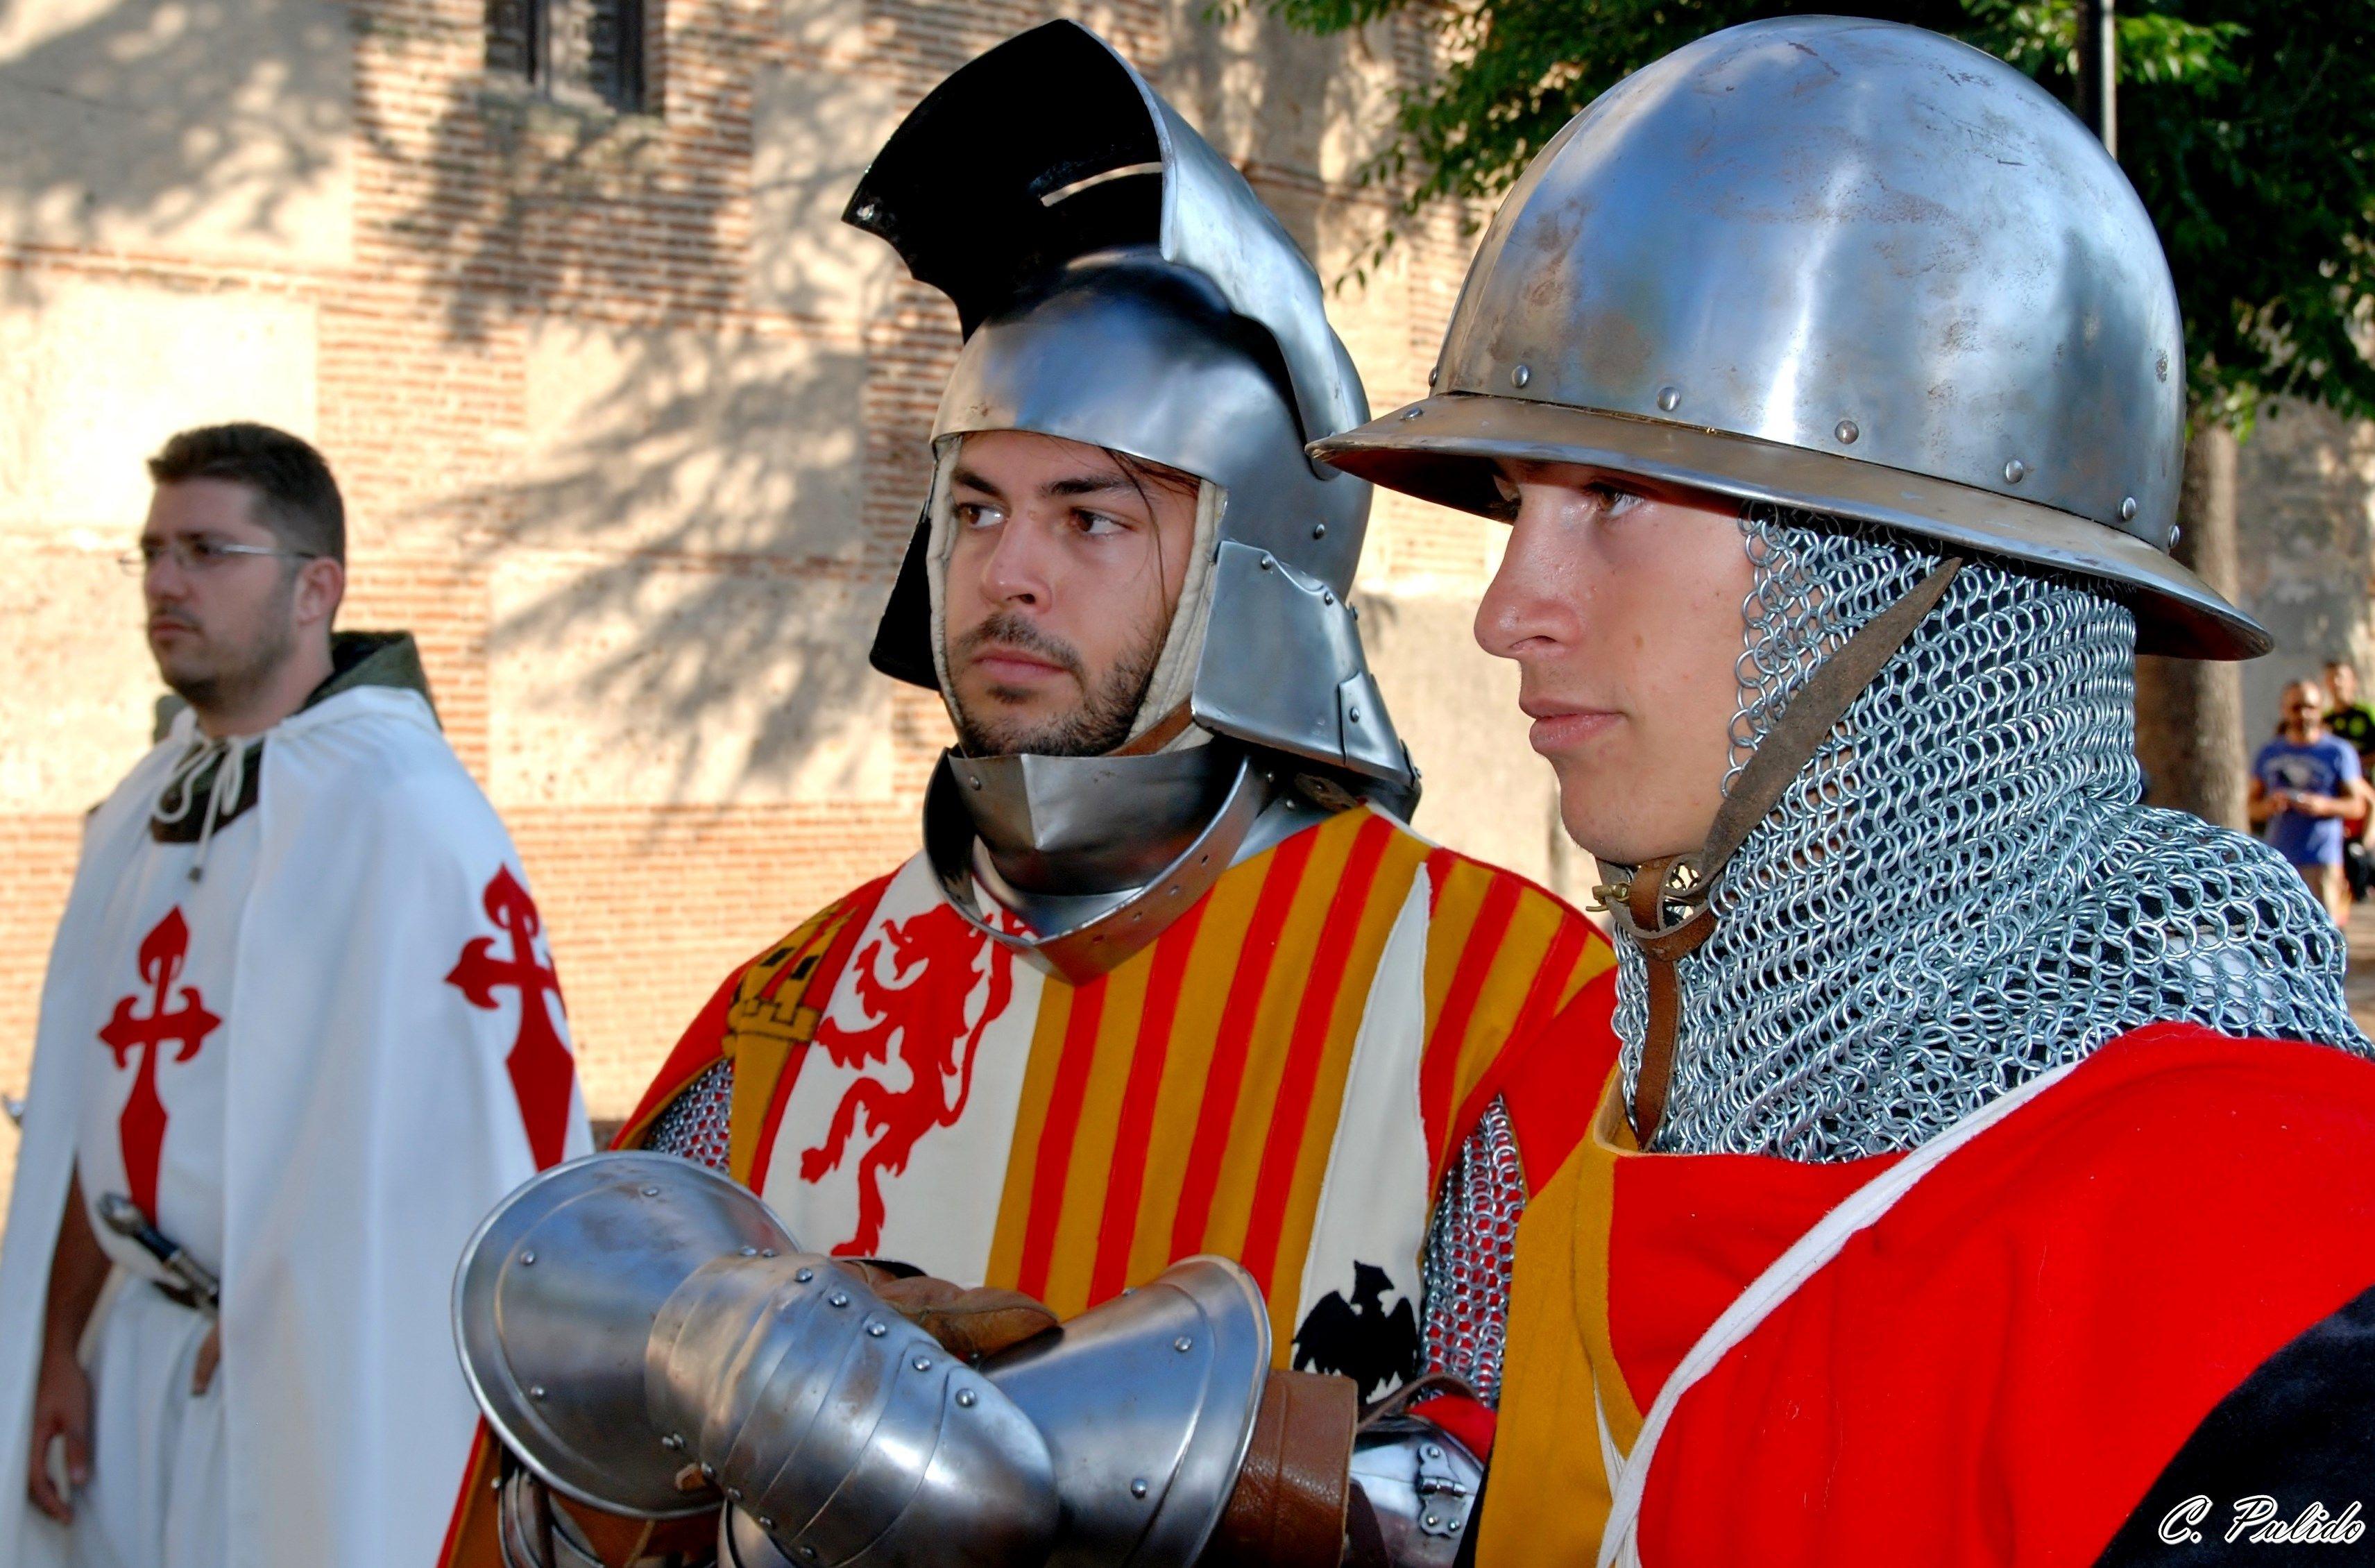 Parte de la Comitiva Castellana Boda de Juan II de Castilla e Isabel de Portugal (Madrigal de las Altas Torres 1447)